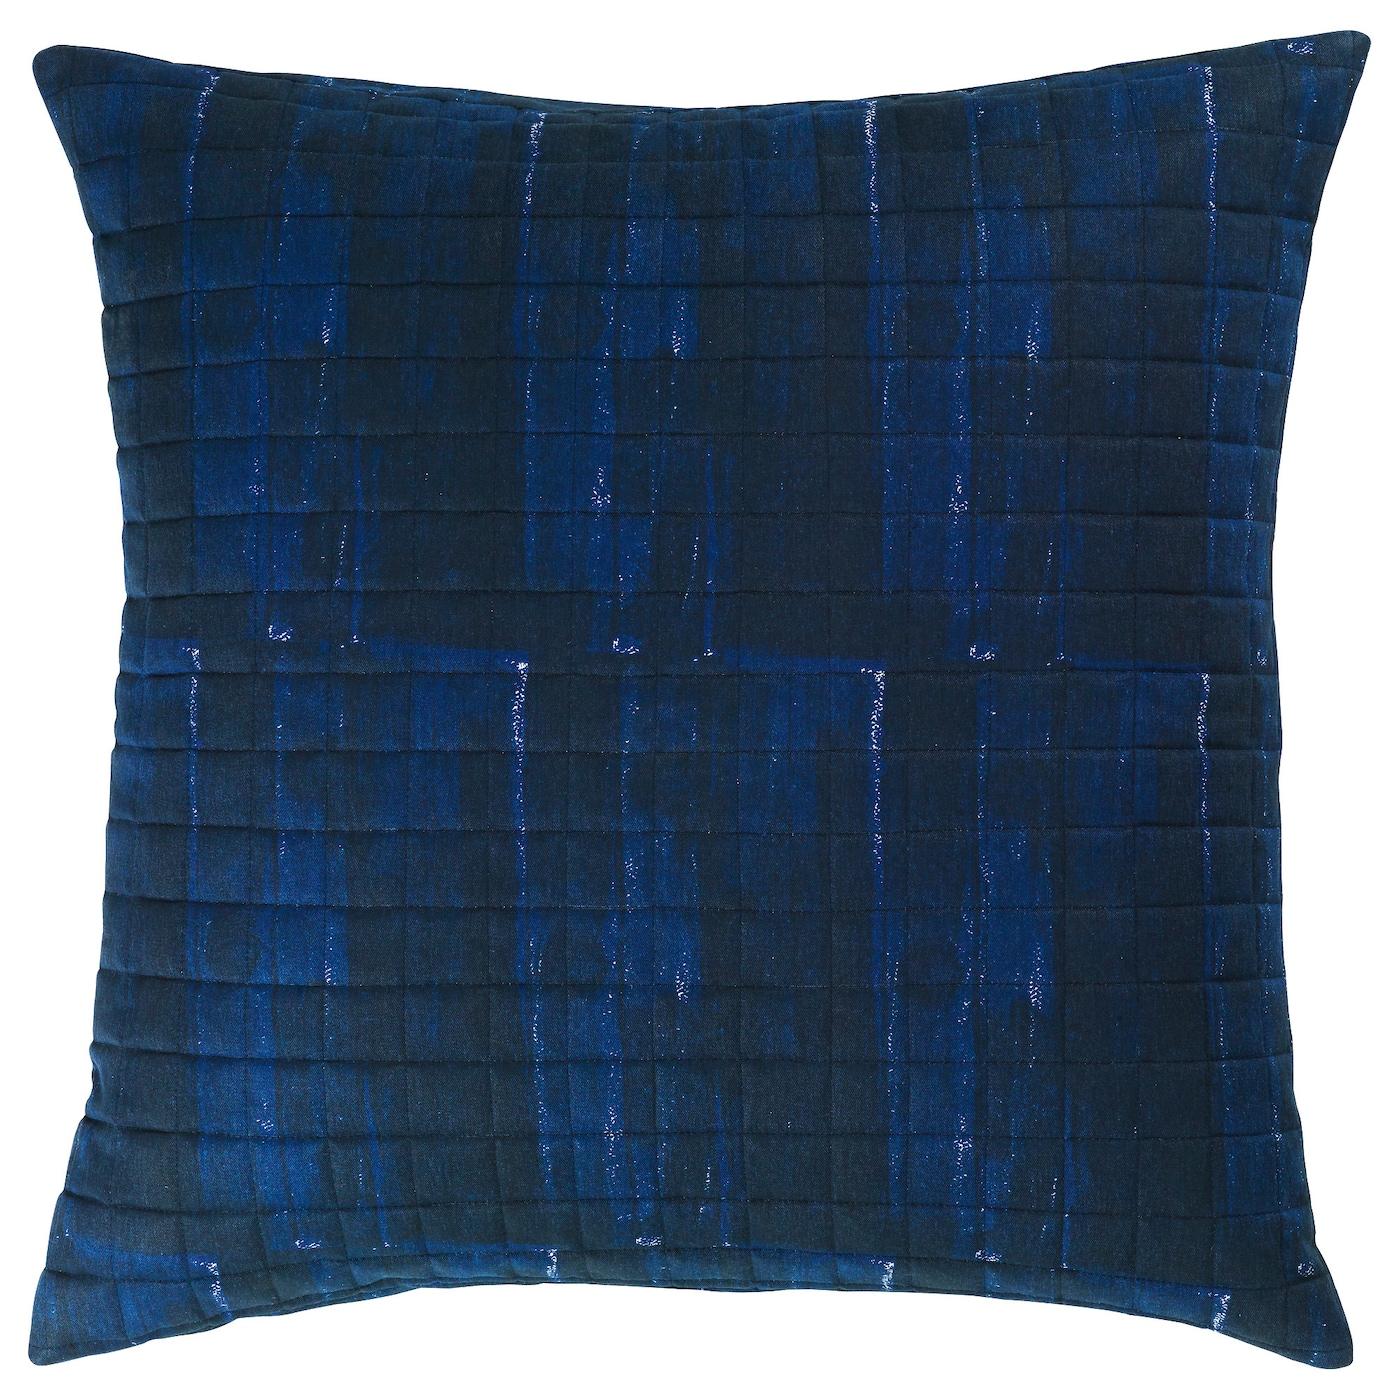 inneh llsrik housse de coussin fait main bleu blanc 50x50 cm ikea. Black Bedroom Furniture Sets. Home Design Ideas